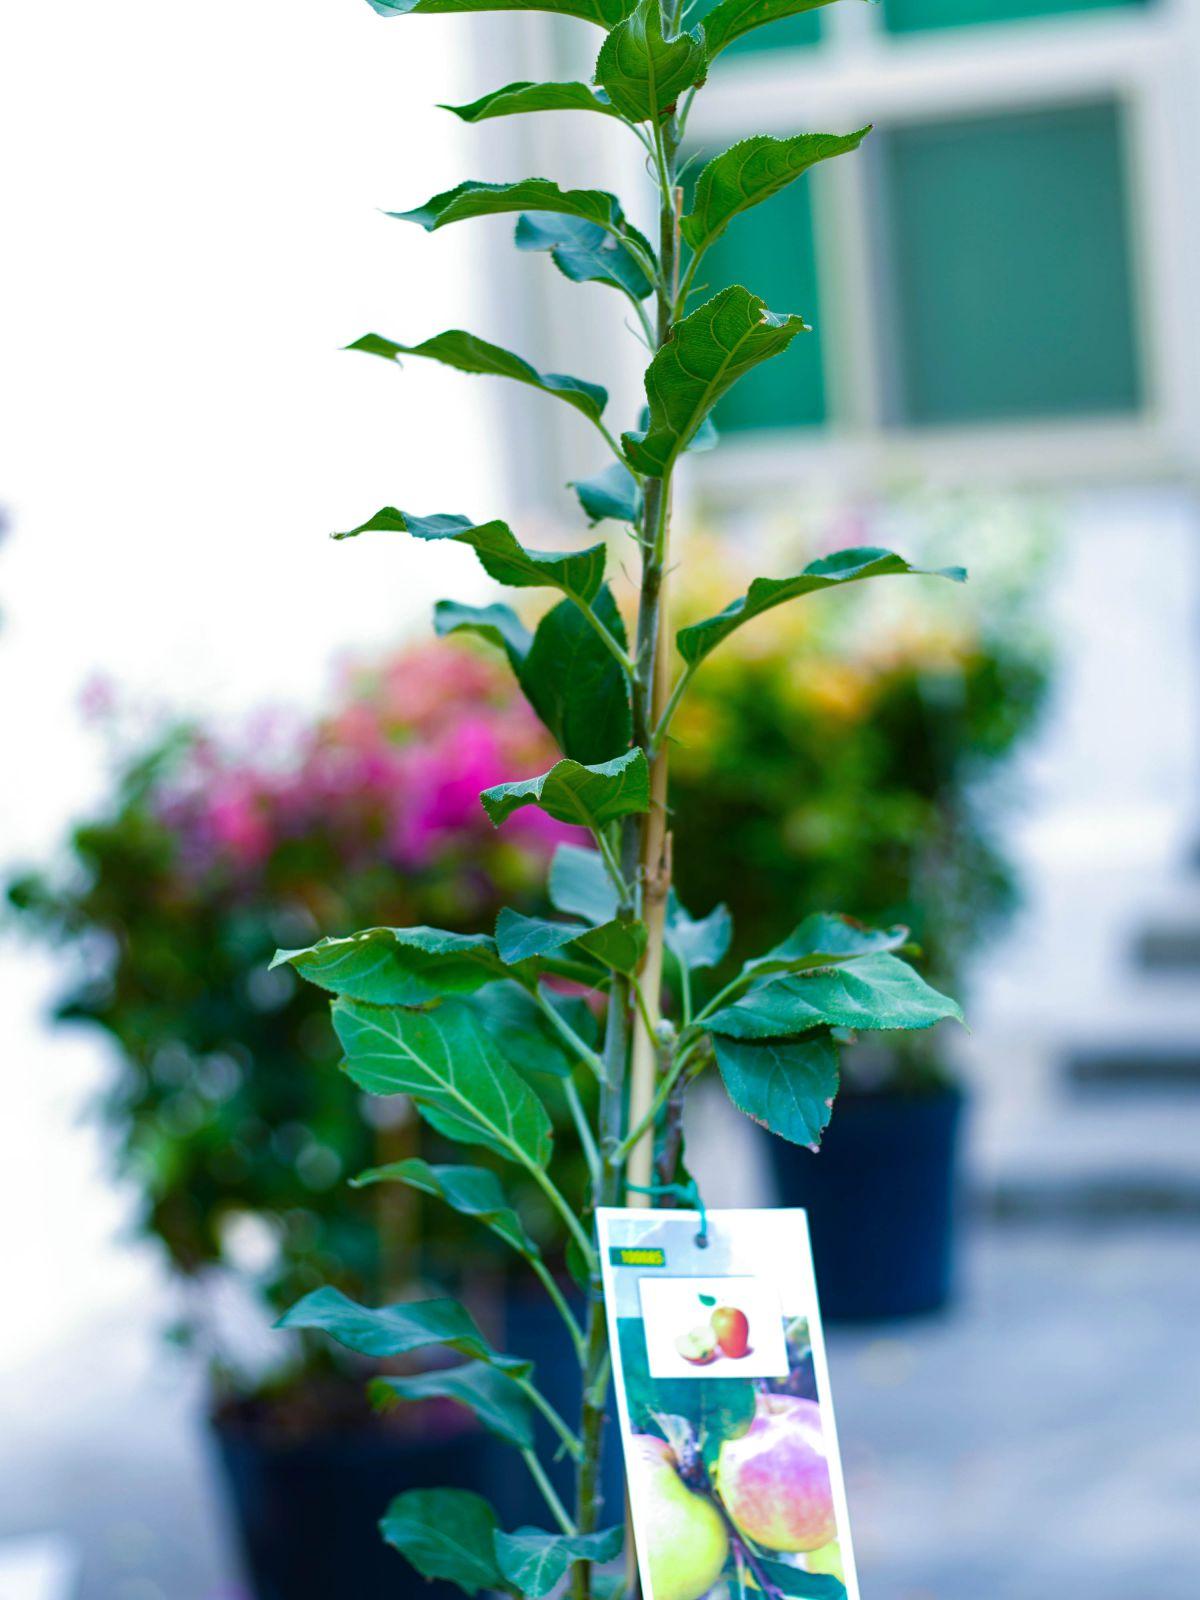 Apple 'Outdoor Plants Fruit Plants